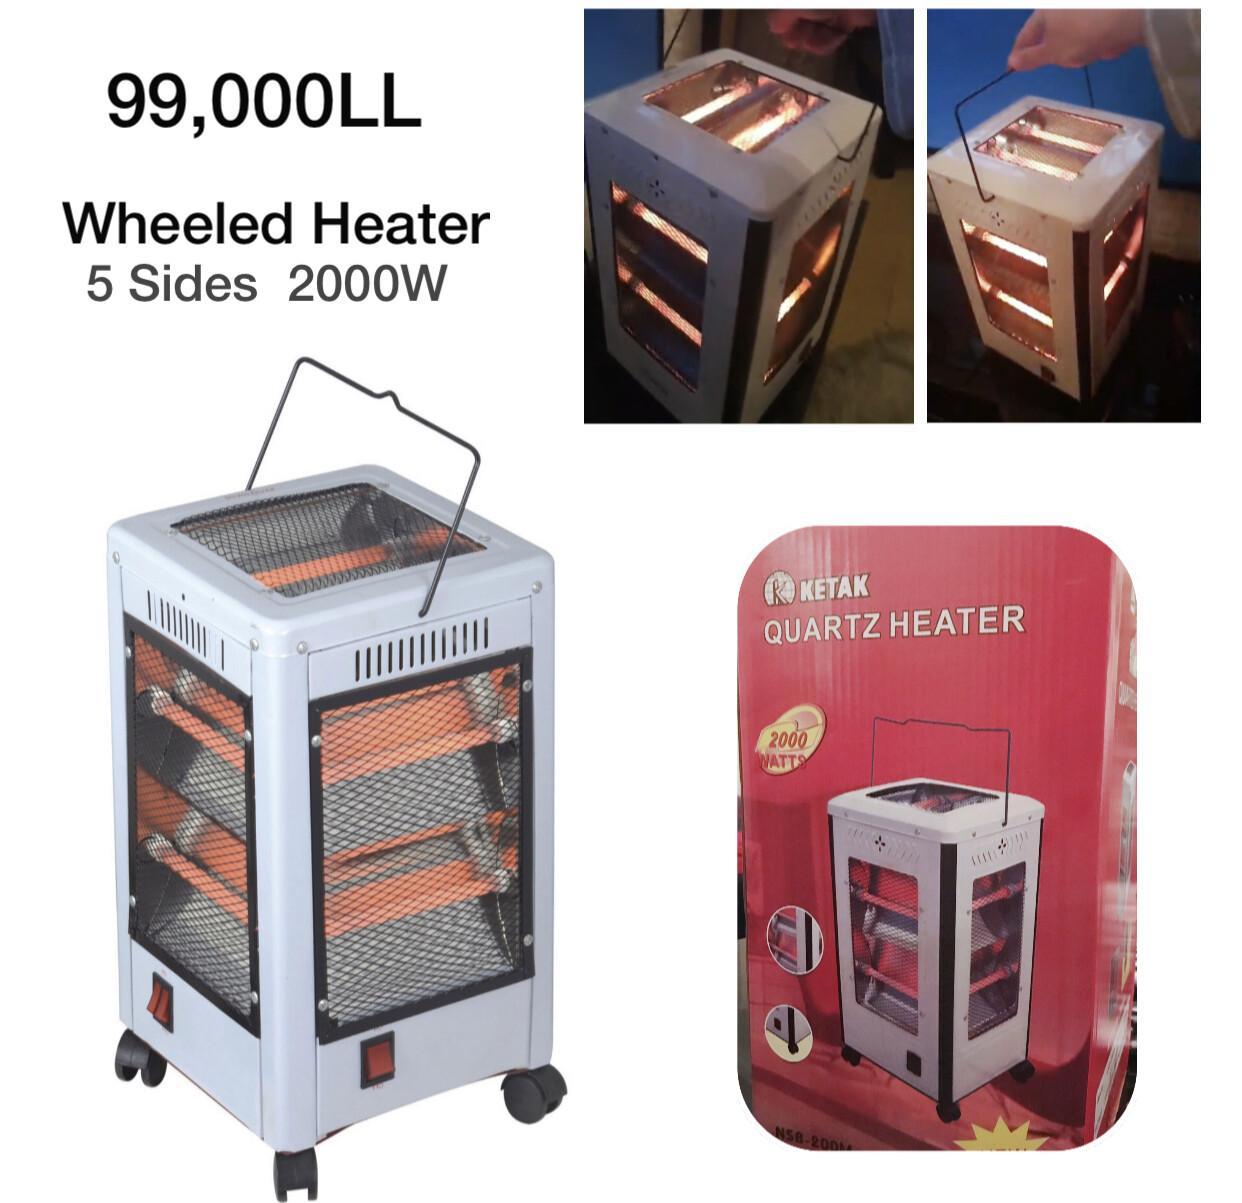 Wheeled Heater